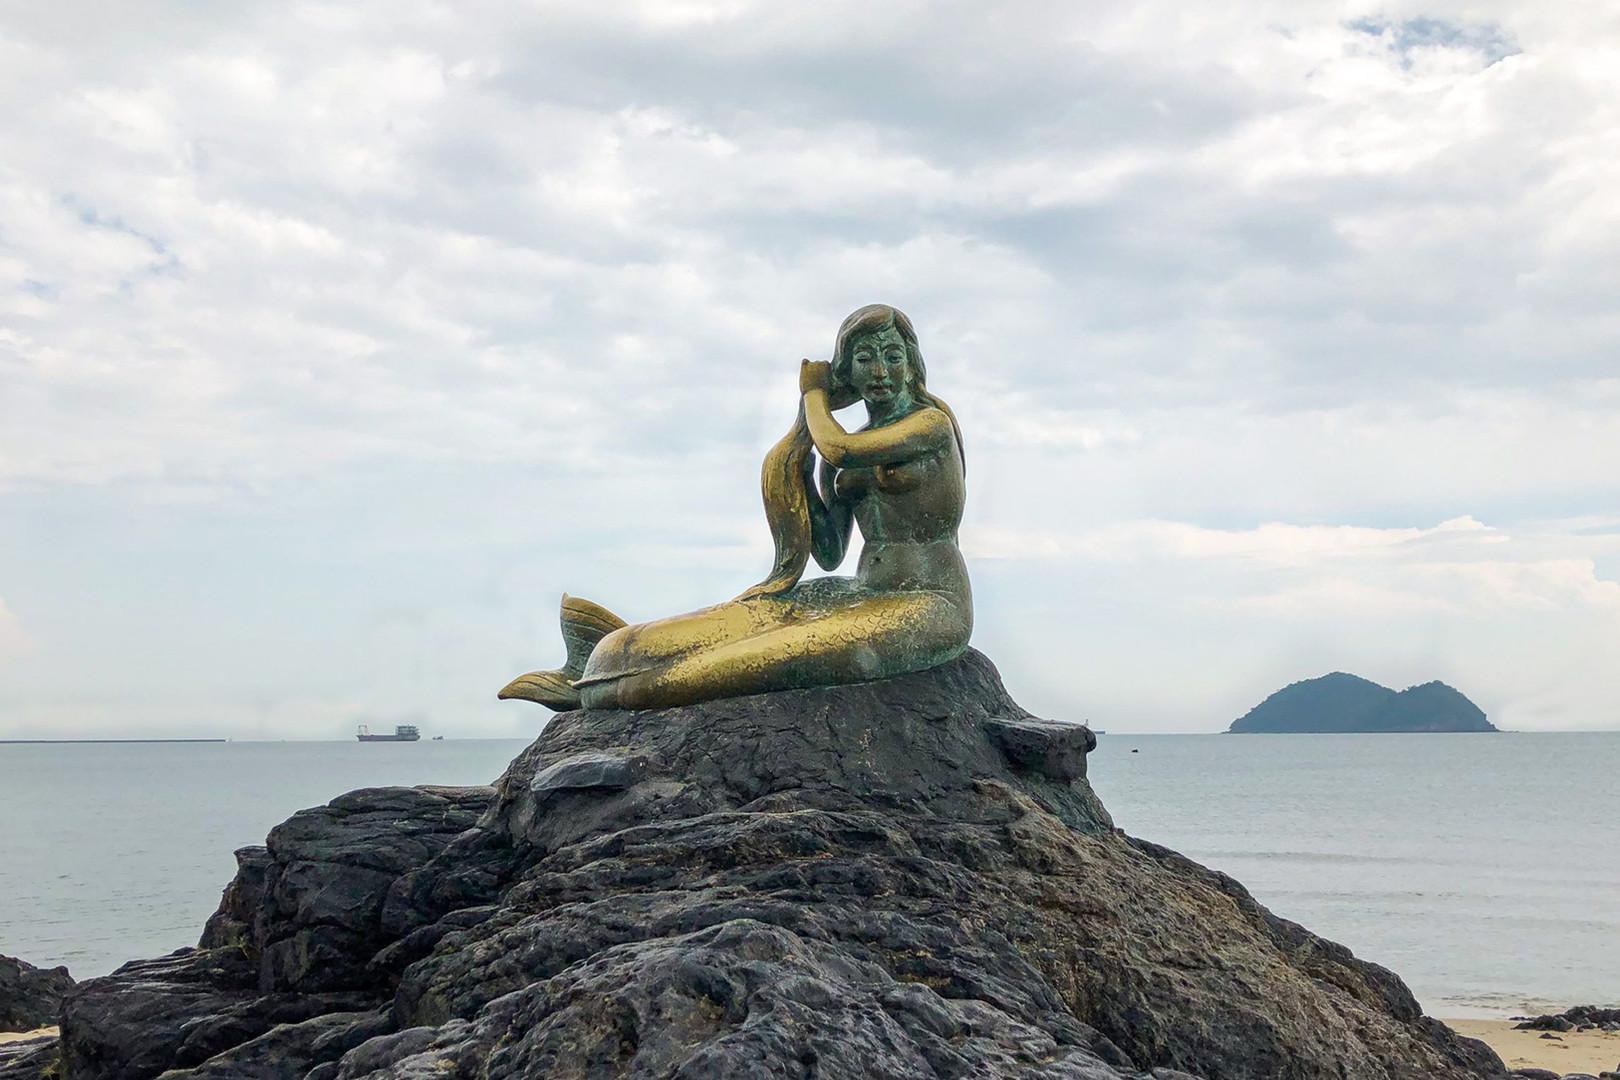 Hat Yai Golden Mermaid Statue